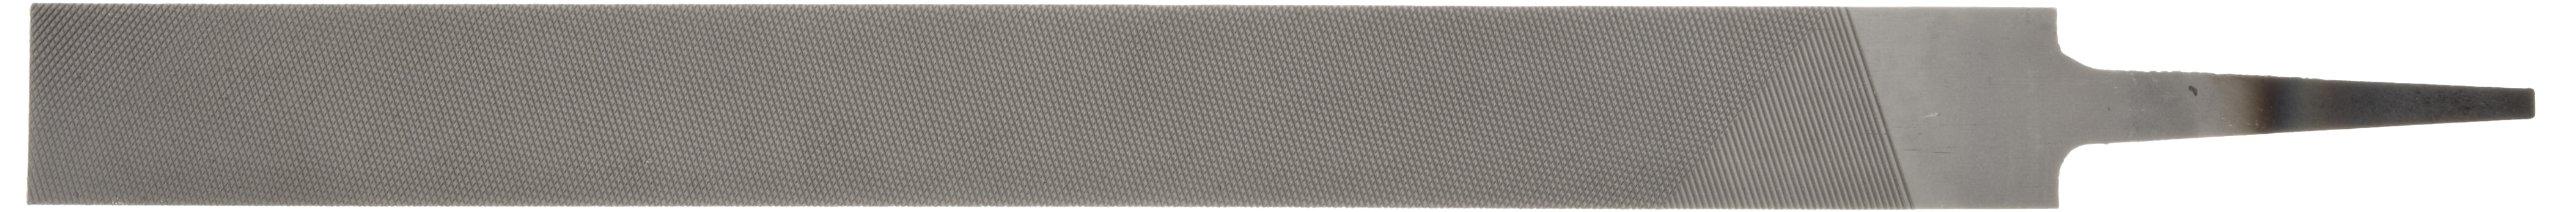 PFERD Hand File, American Pattern, Double Cut, Rectangular, Medium, 10'' Length, 31/32'' Width, 1/4'' Thickness